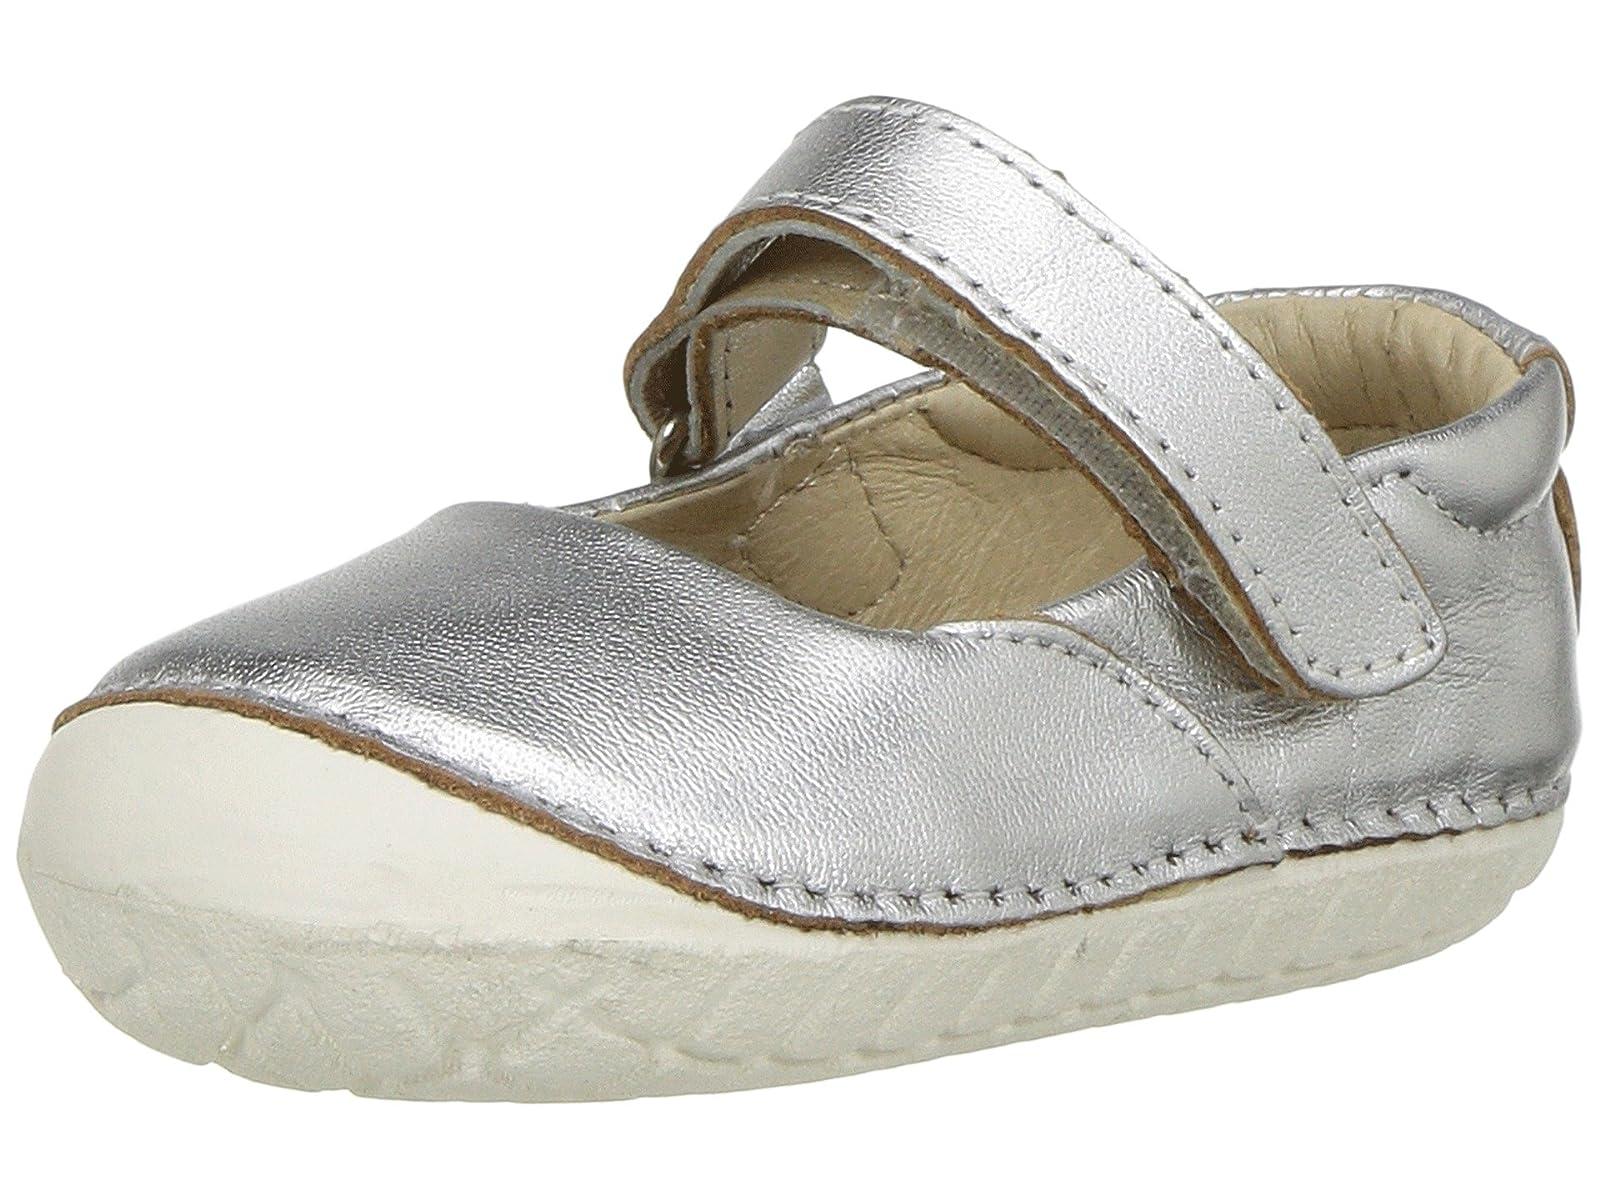 Old Soles Pave Jane (Infant/Toddler)Atmospheric grades have affordable shoes